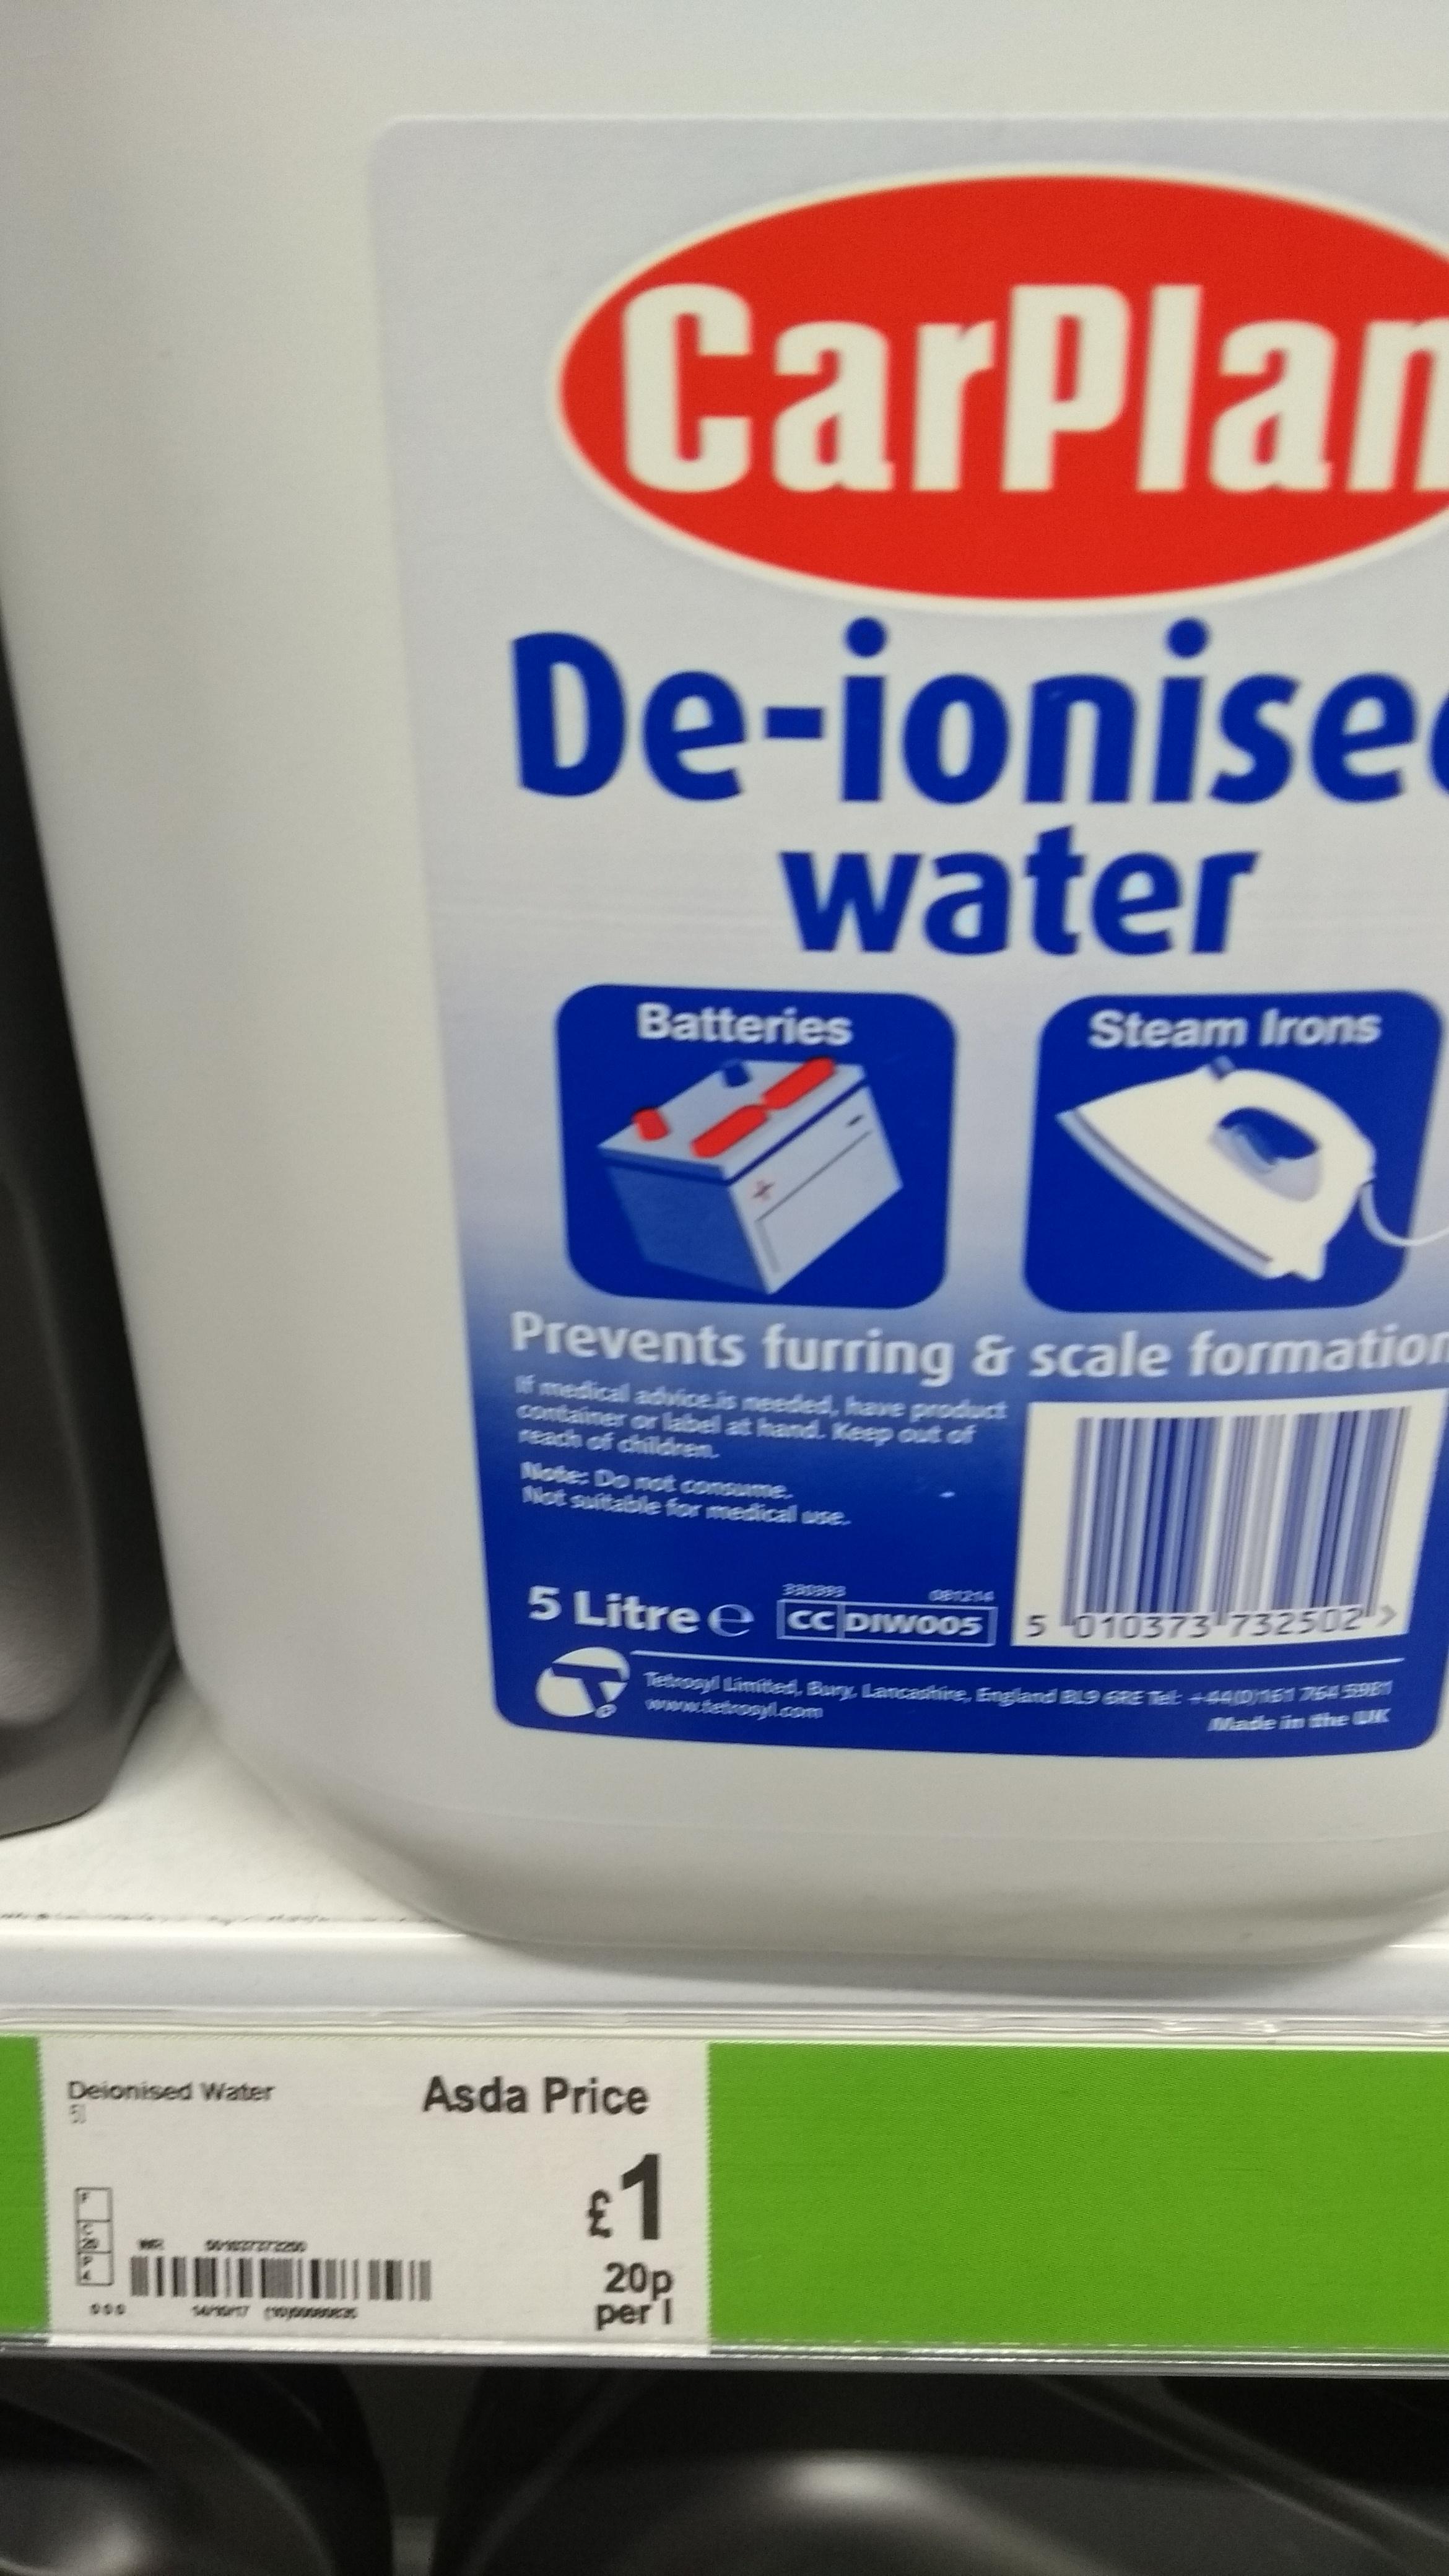 5Lt Car Plan De-Ionised Water £1.00 @ Asda ( Instore)